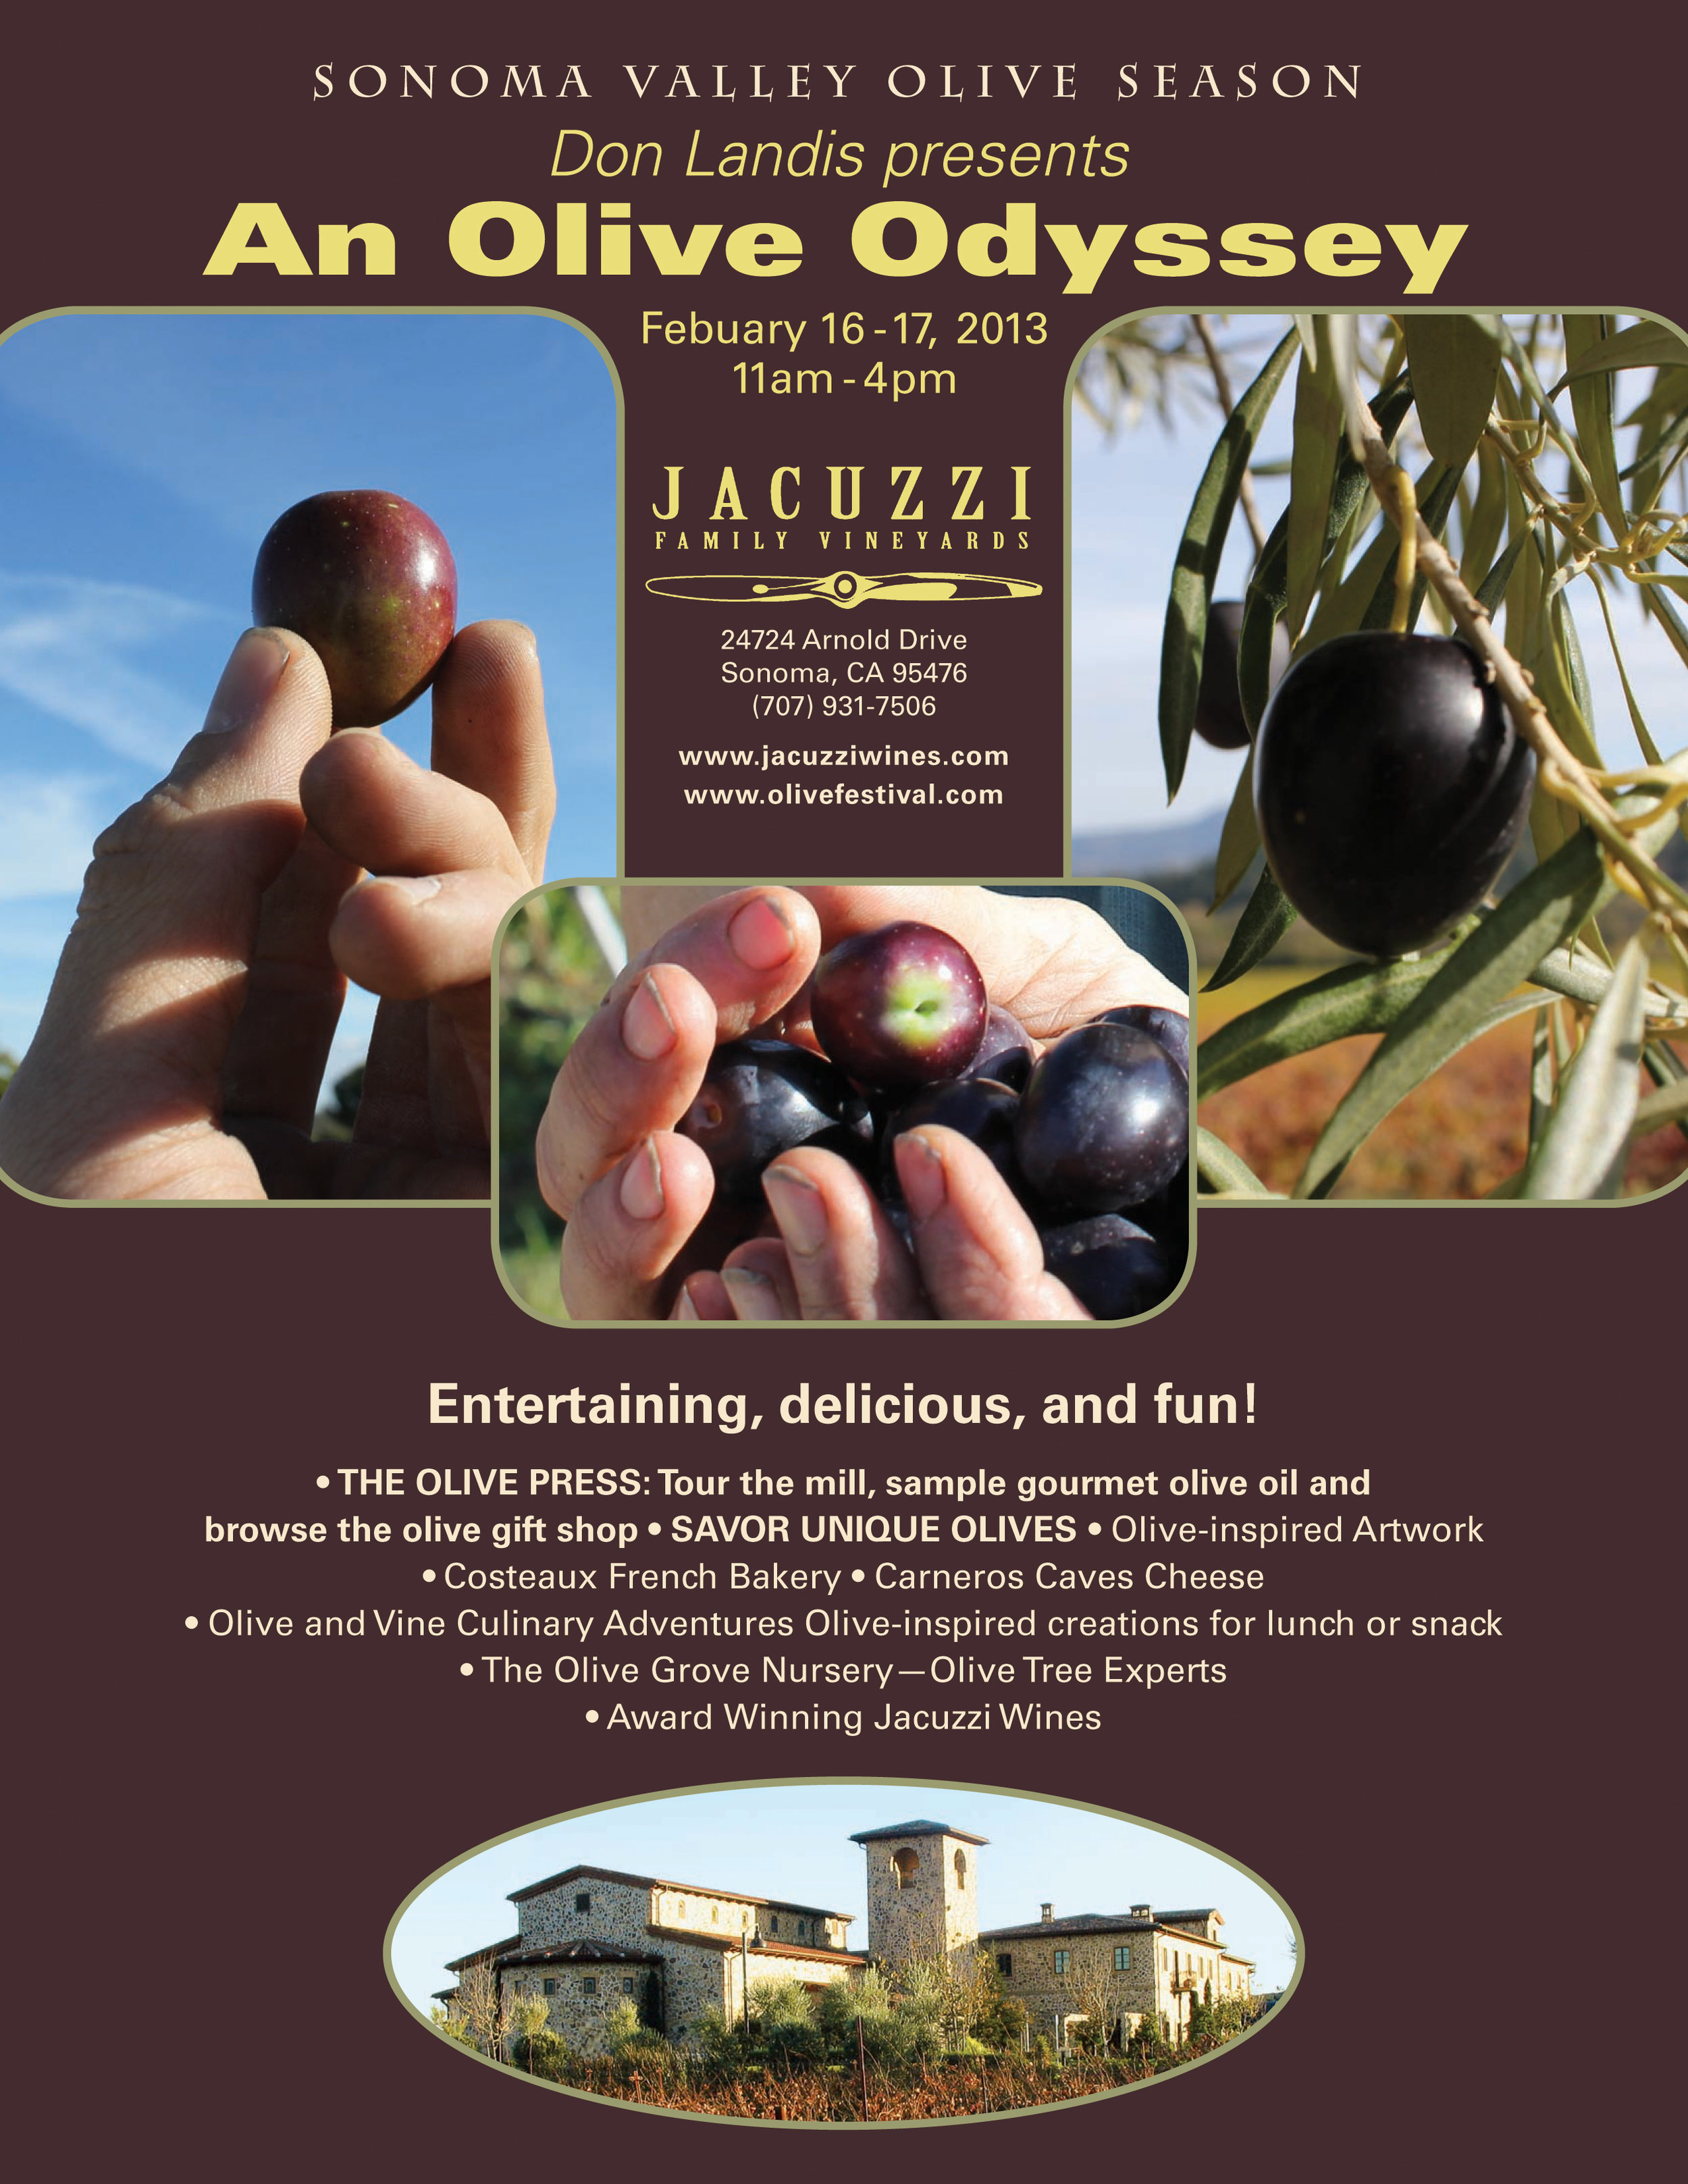 07 Olive Odyssey 2013 8.5x11_r4.jpg